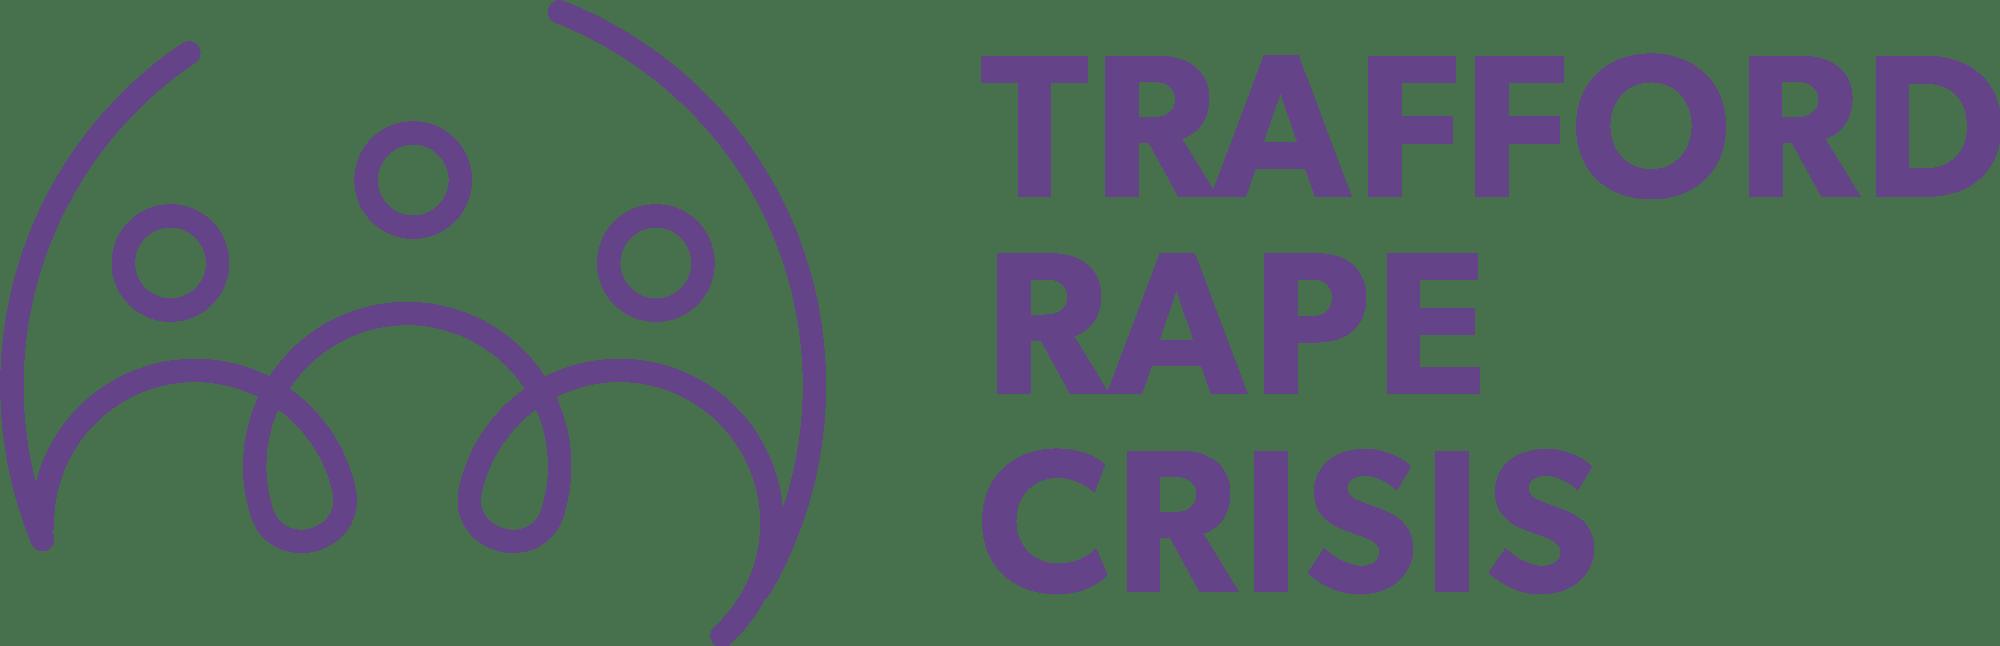 Trafford Rape Crisis